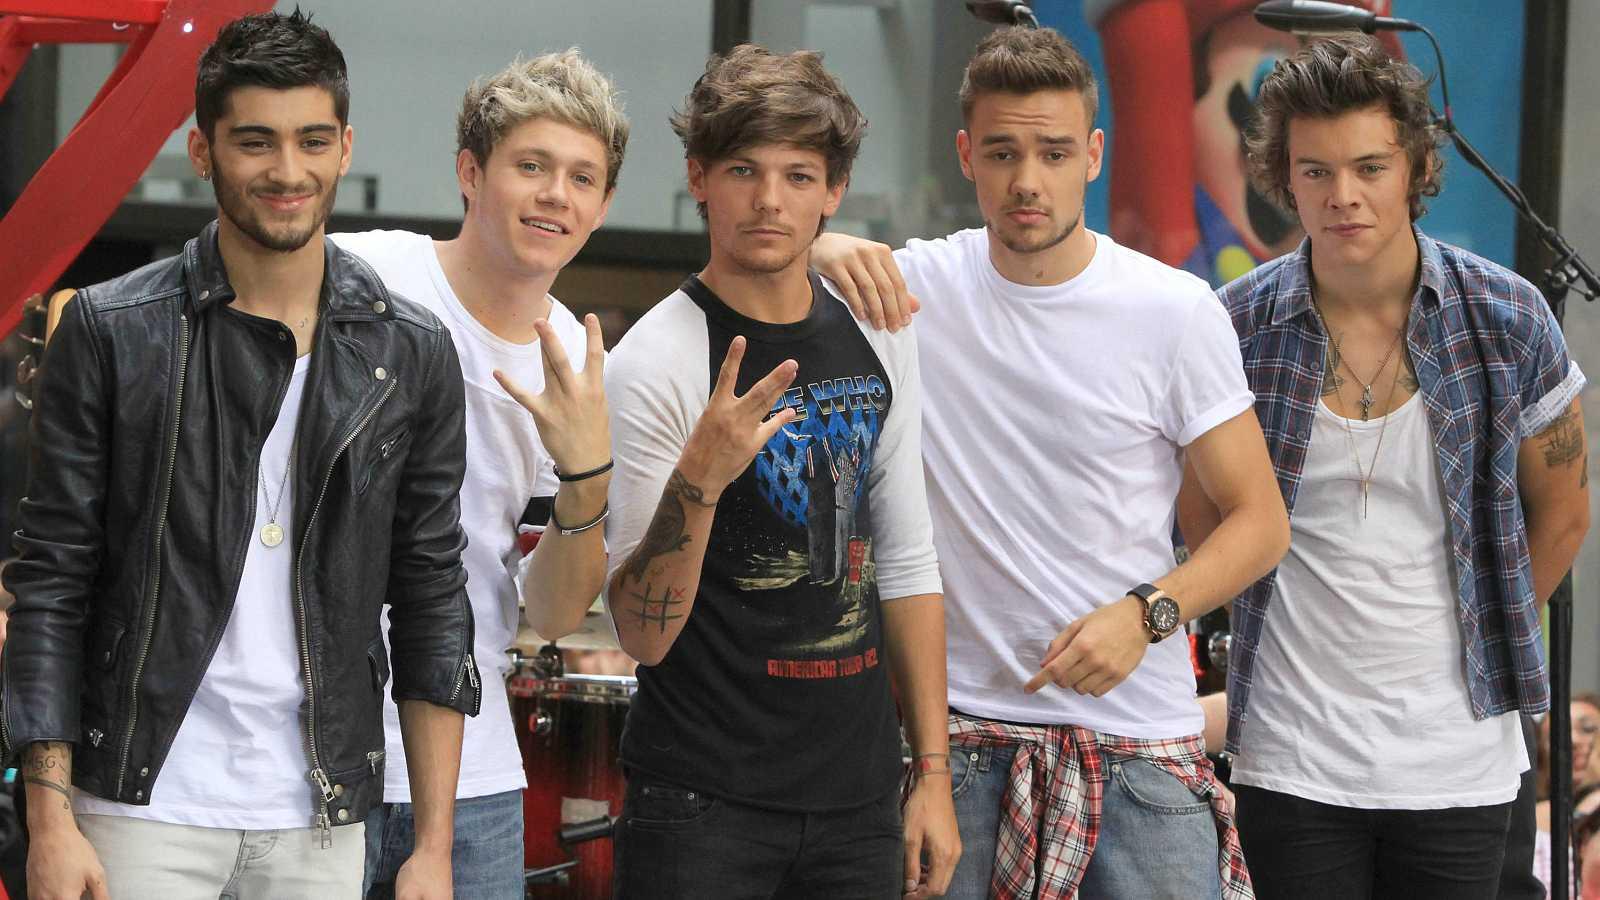 One Direction: Niall Horan, Harry Styles, Zayn Malik, Liam Payne y Louis Tomlinson en el año 2013.